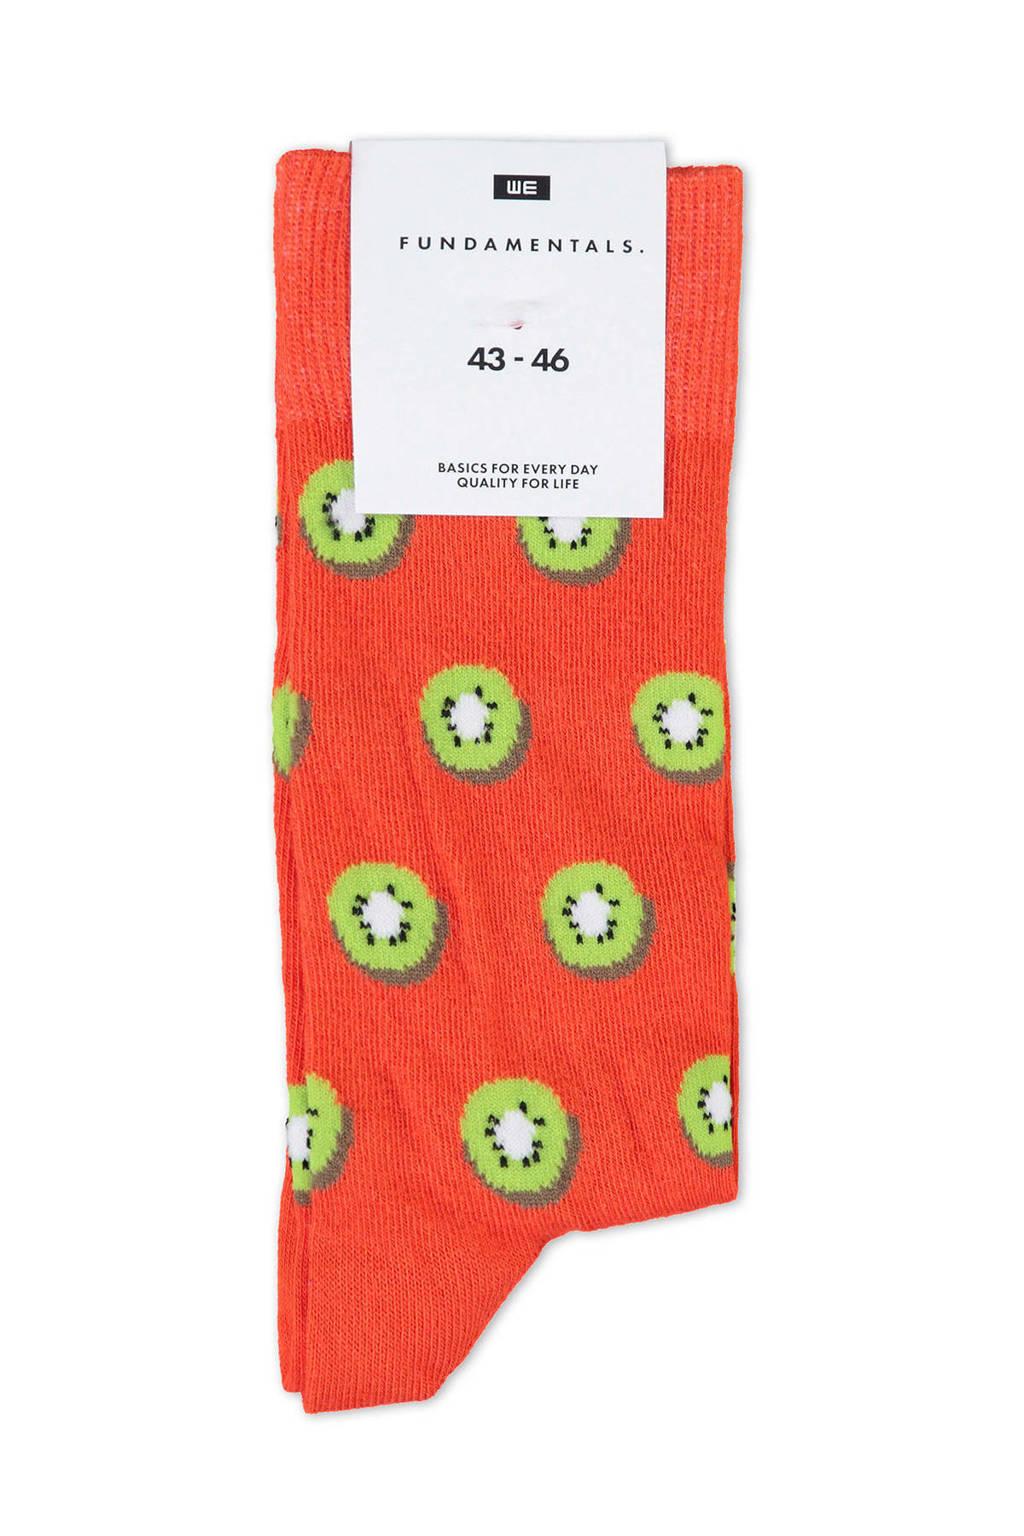 WE Fashion Fundamental oranje sokken met kiwi print, Fire